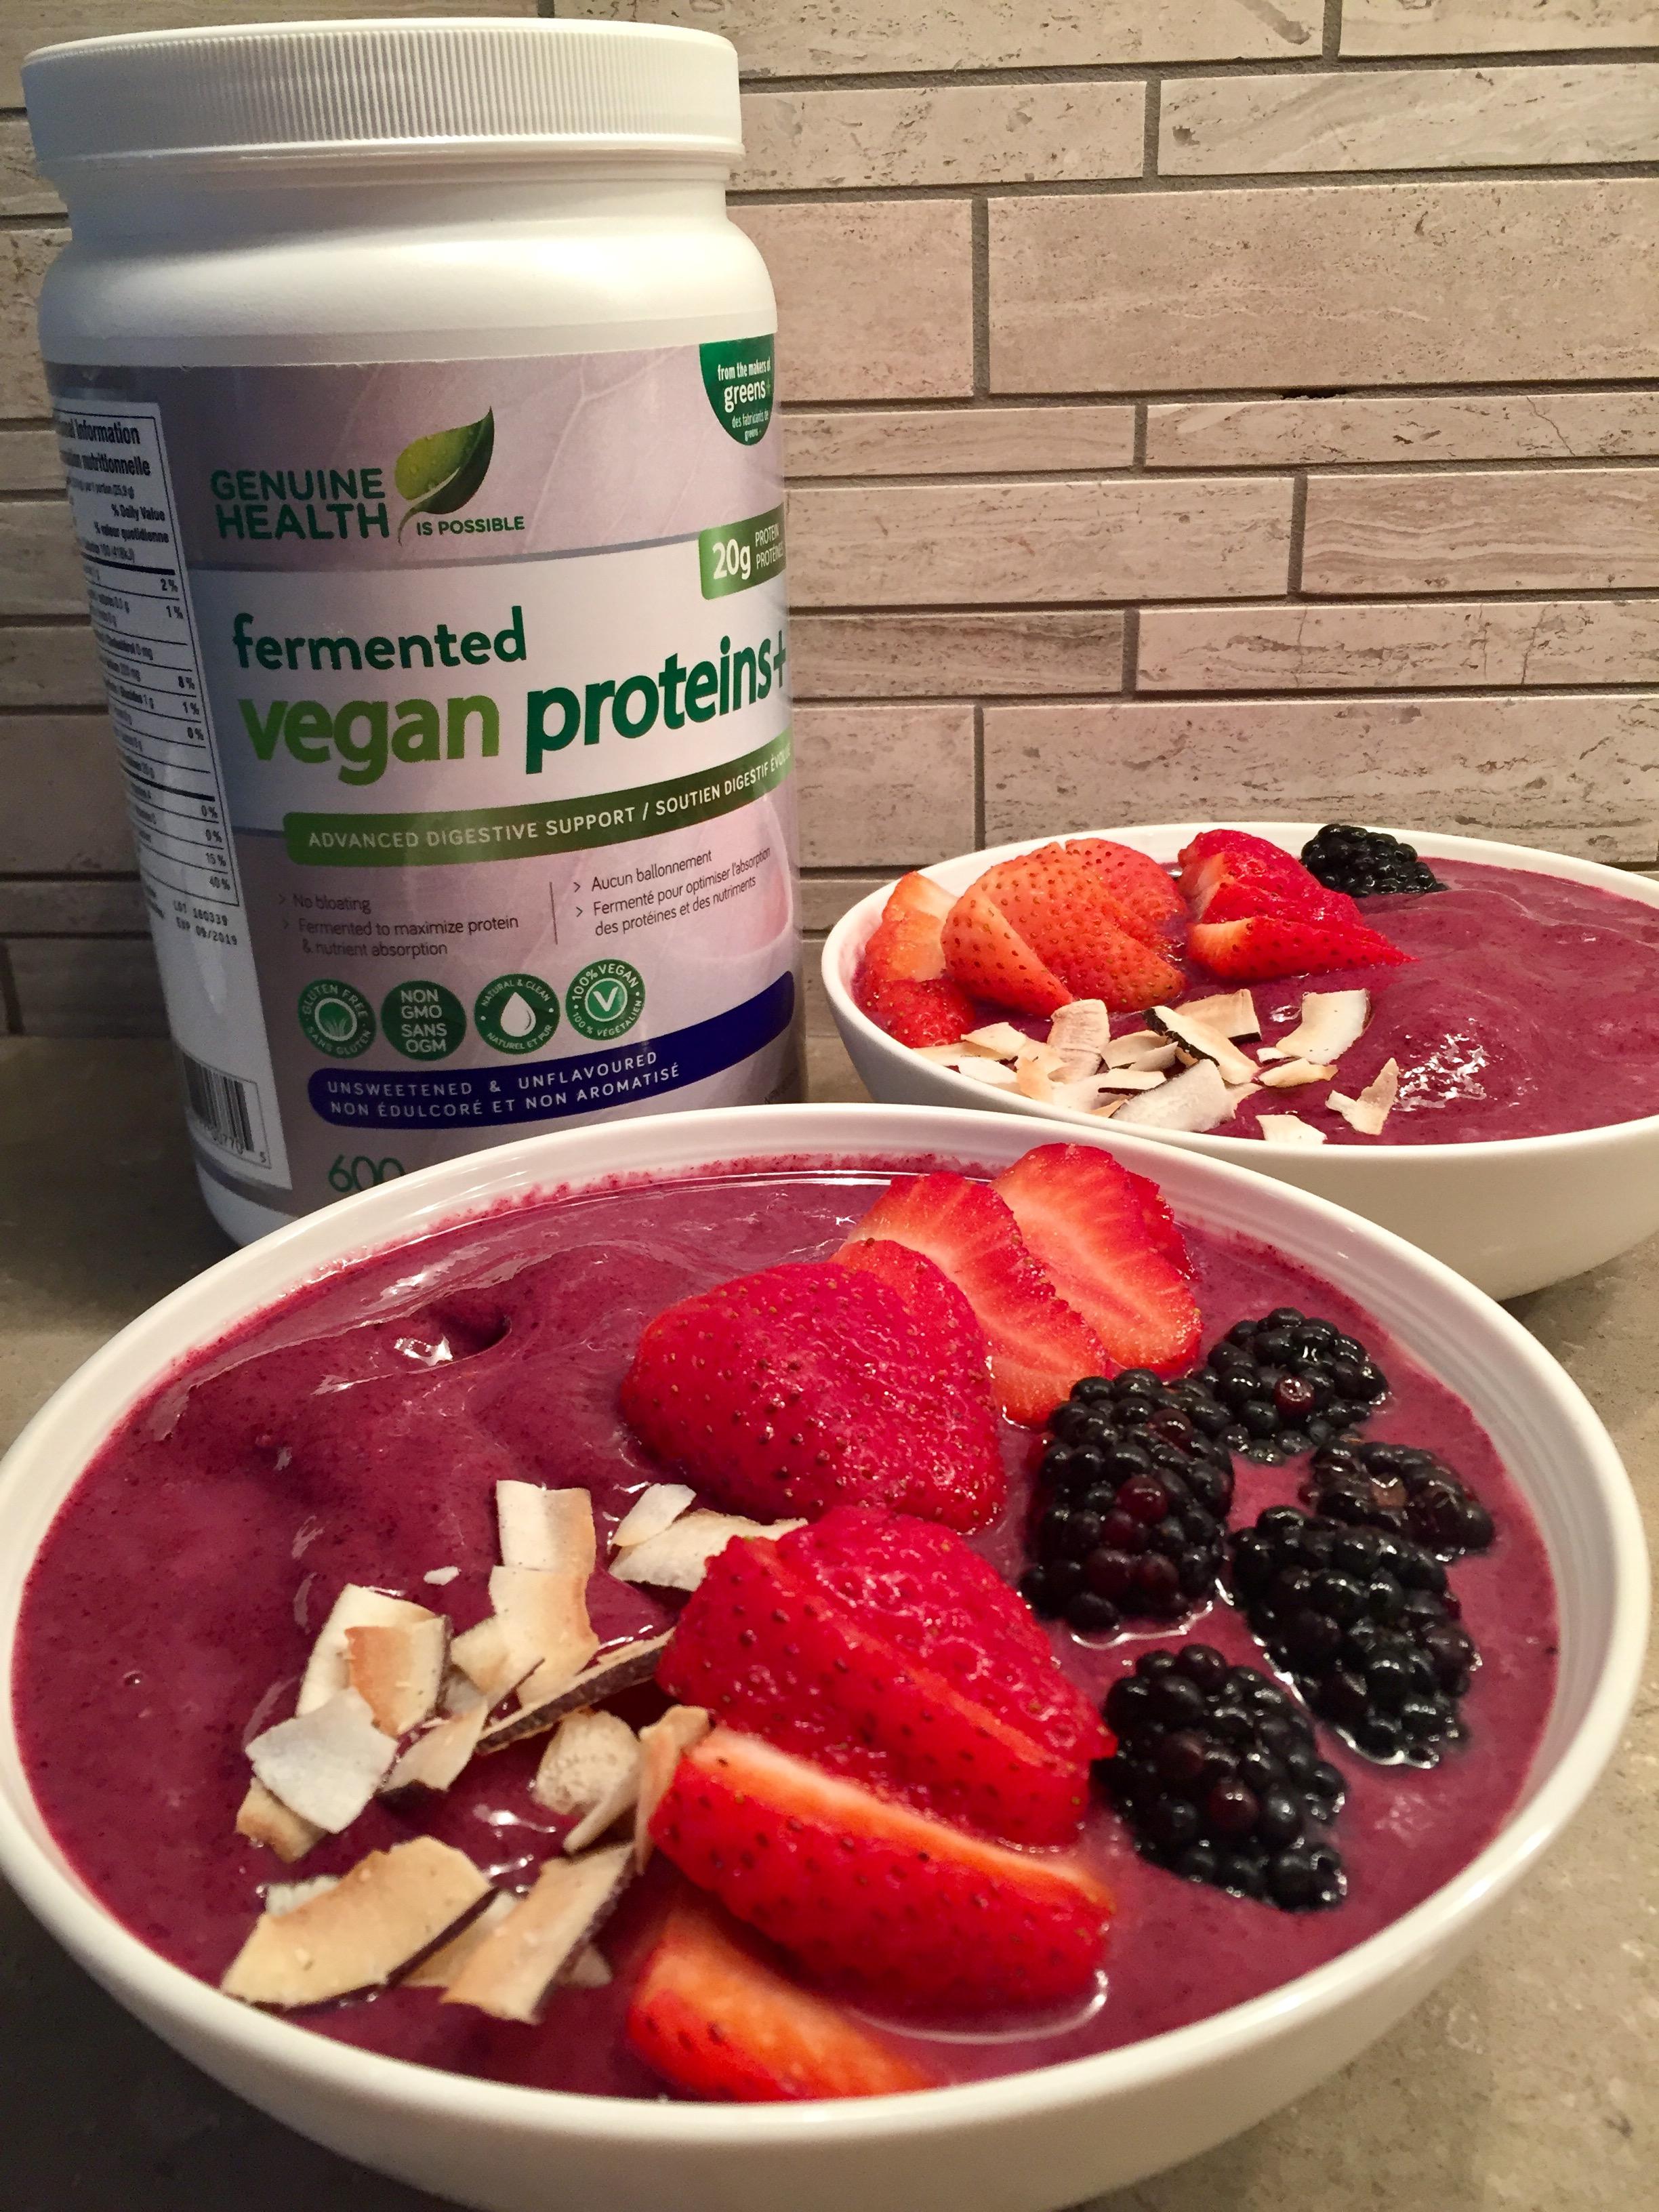 Genuine Health Berry Smoothie